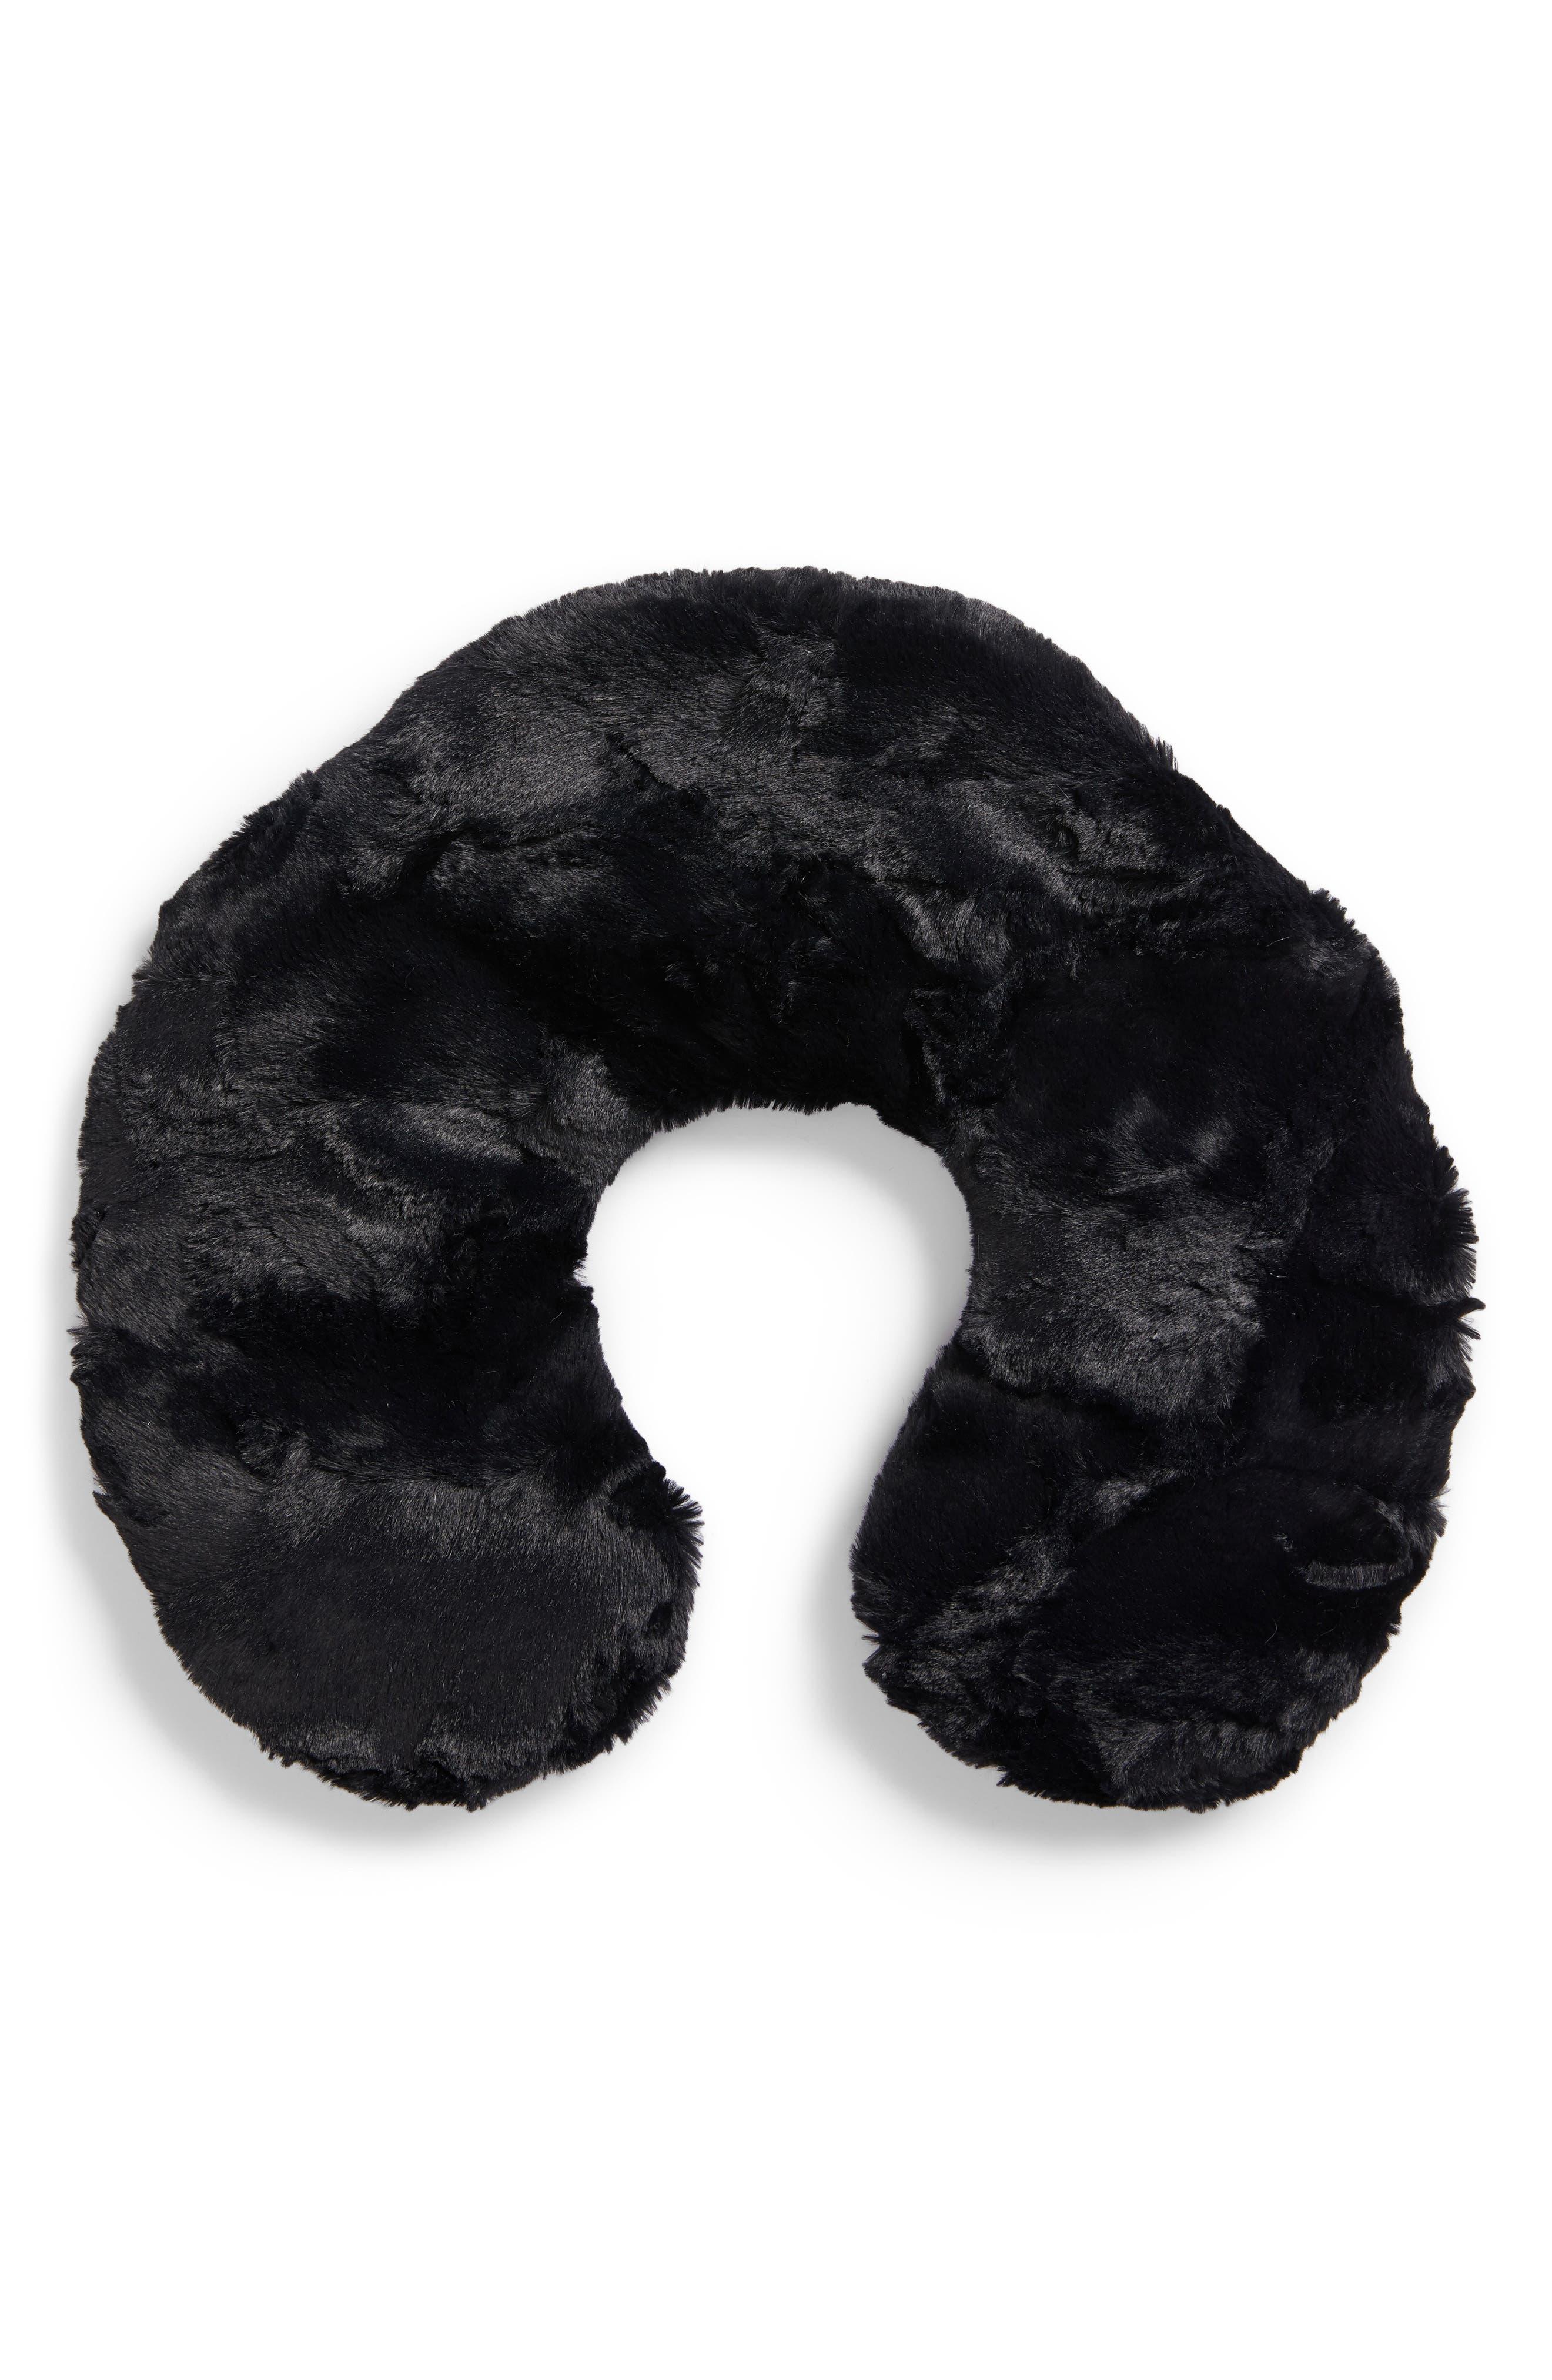 SONOMA LAVENDER, Caviar Black Neck Pillow, Main thumbnail 1, color, NO COLOR